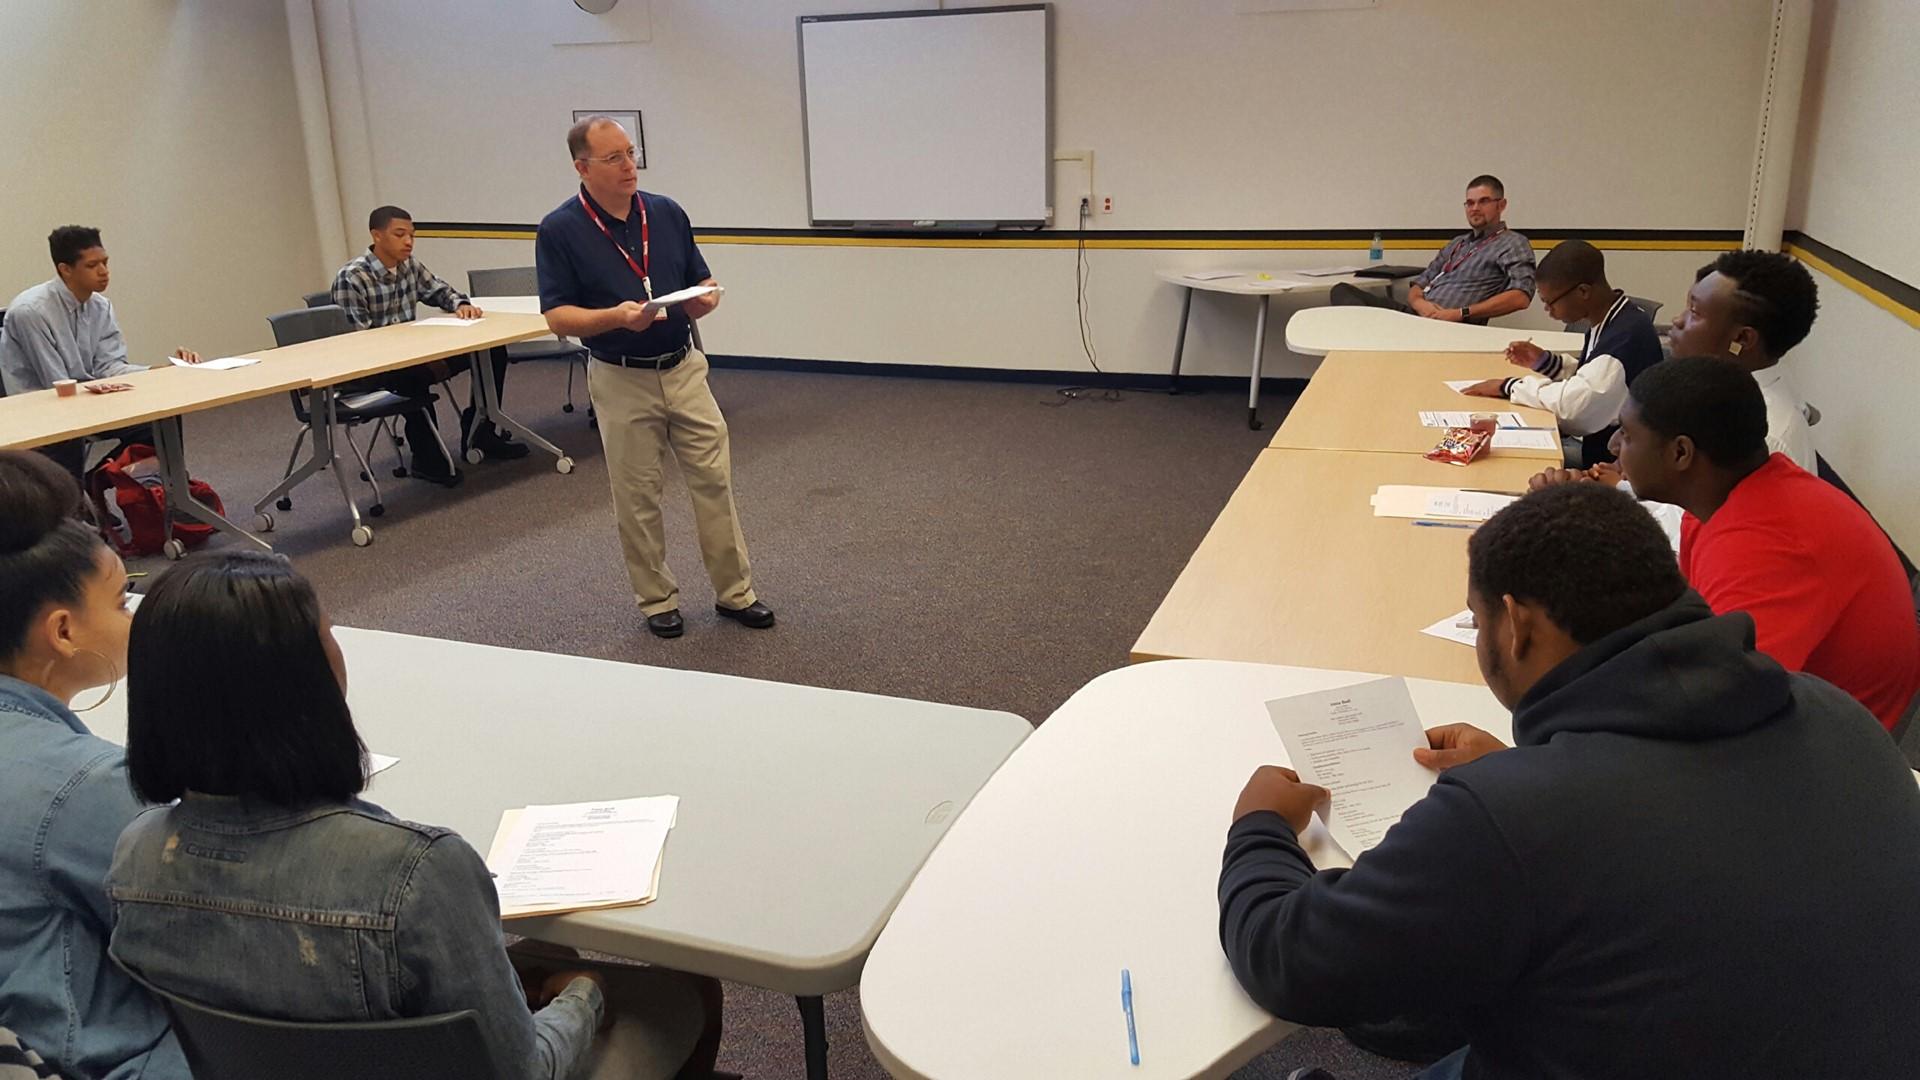 T.J. Maxx Store Manager visits our CBI Program to teach employability skills.